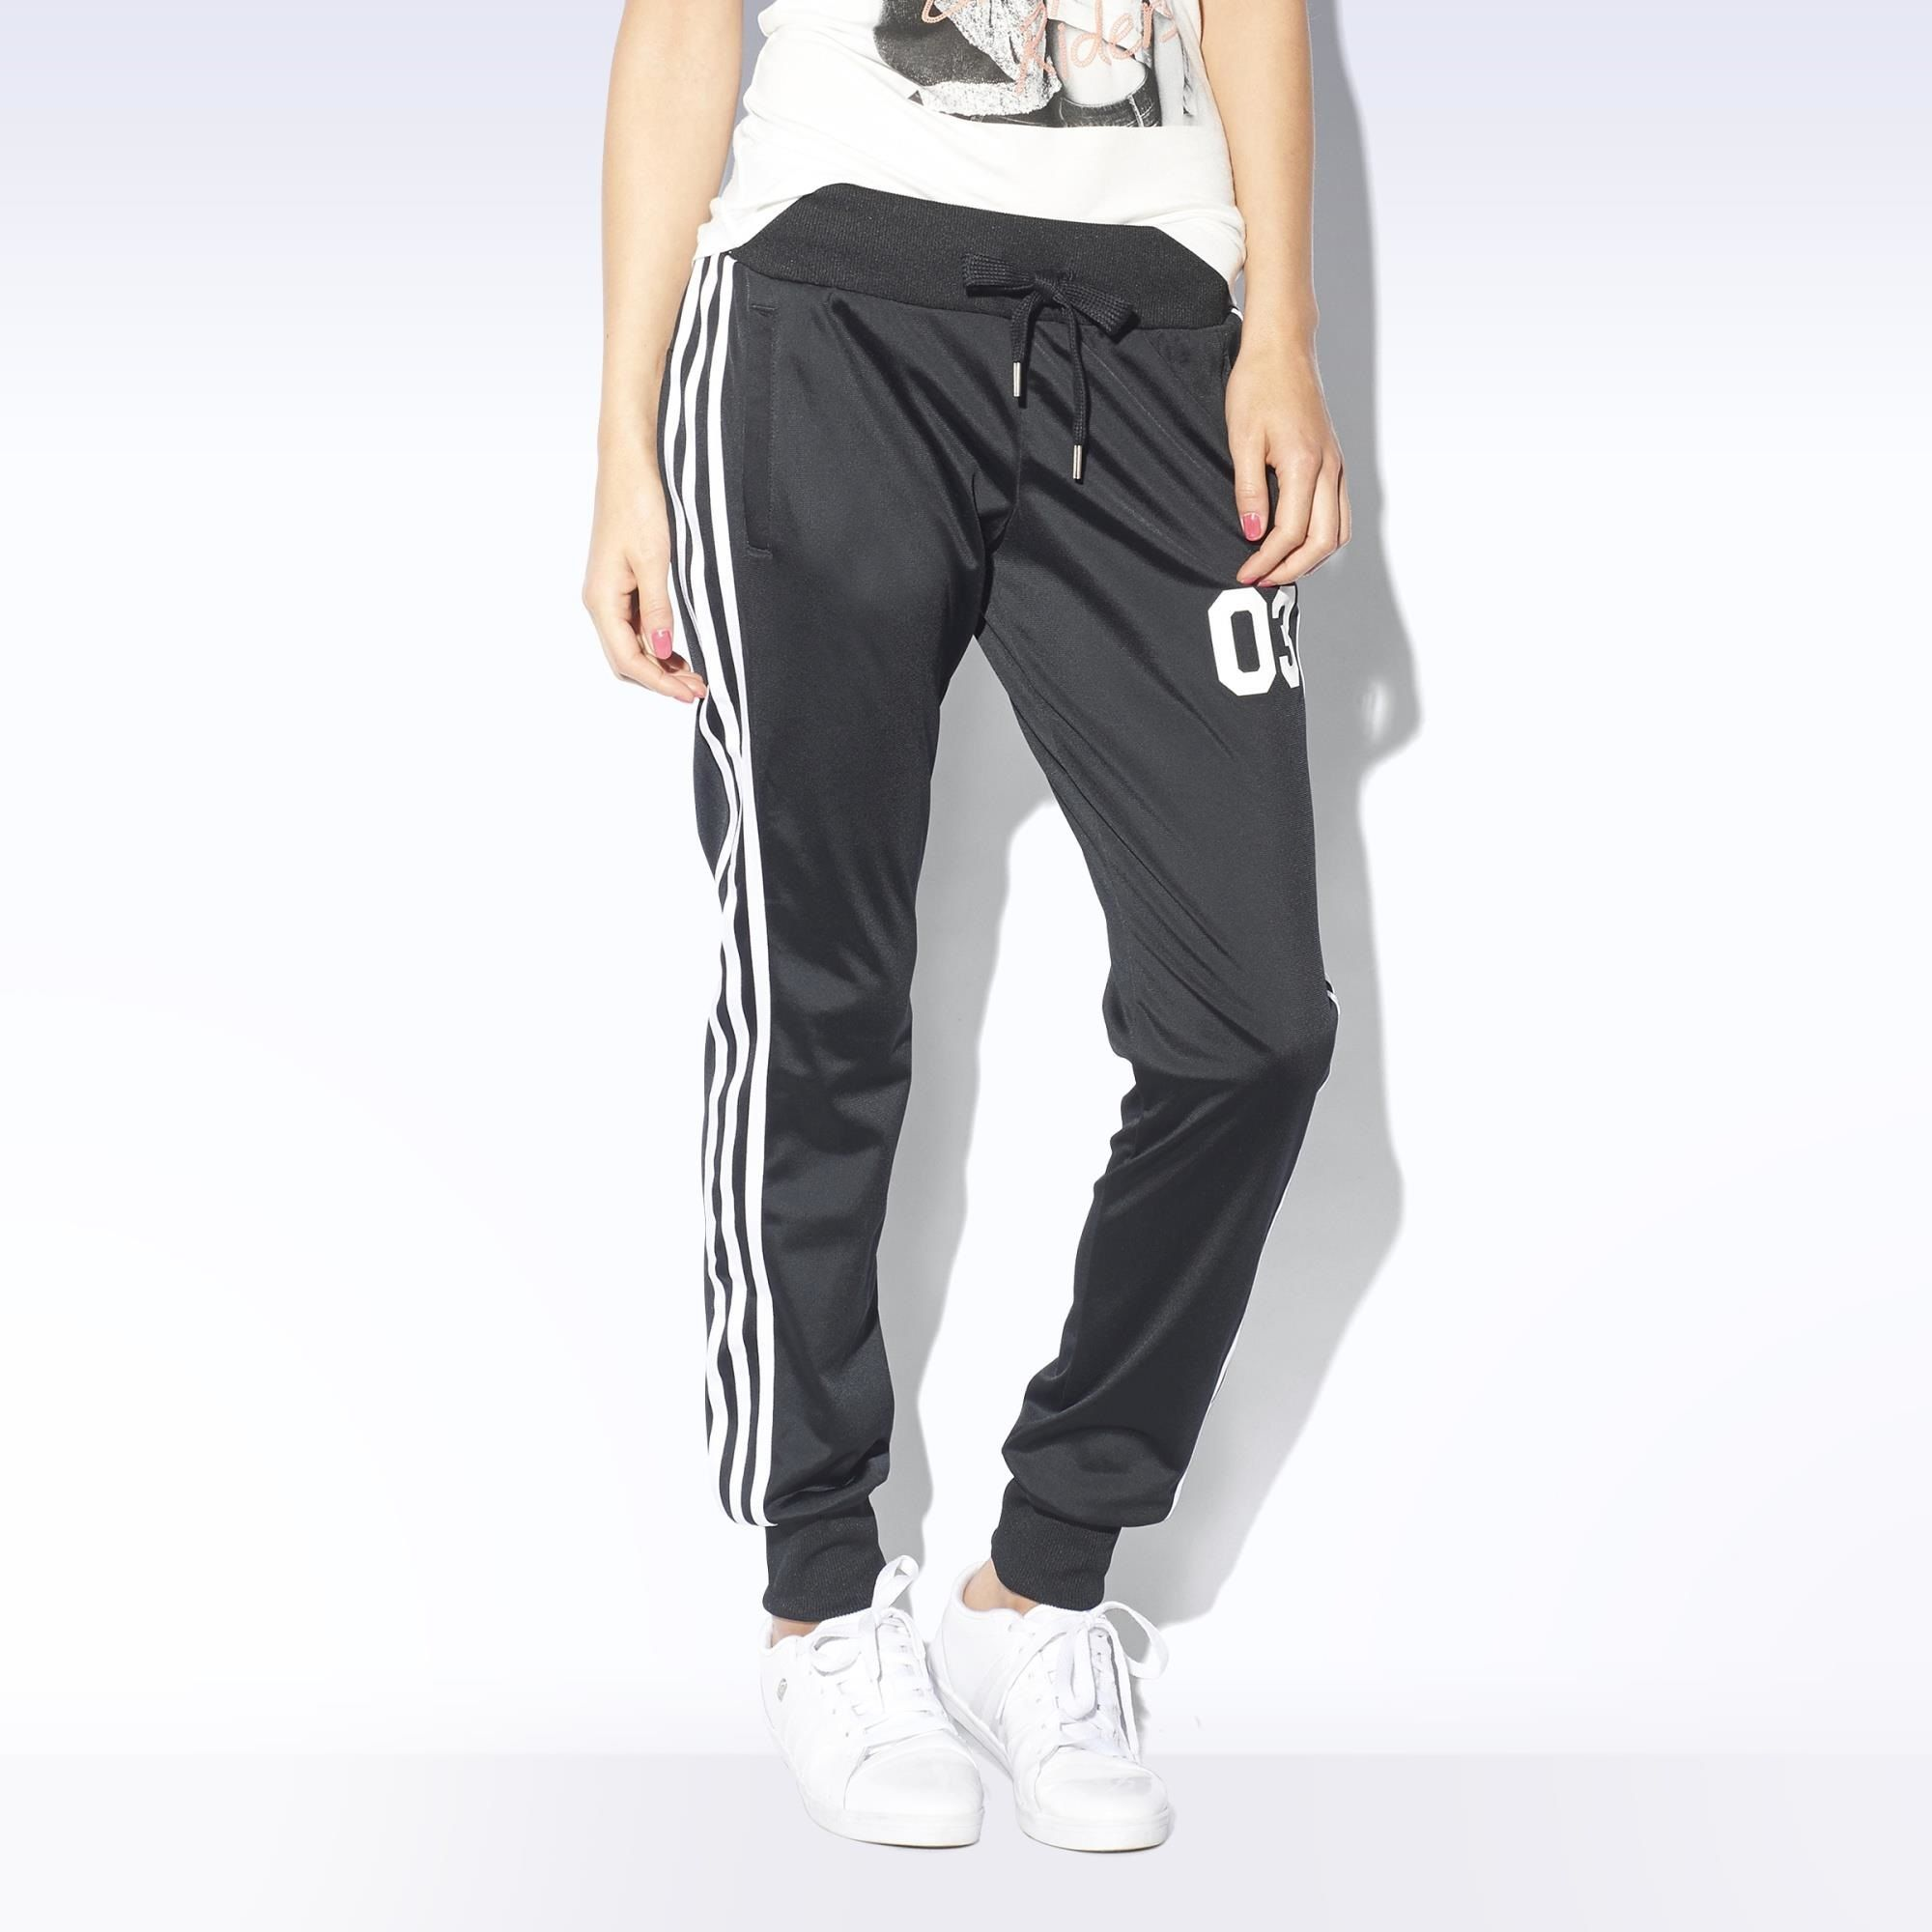 f5e7470f5af53 adidas - Pantalón de Buzo adidas Mujer